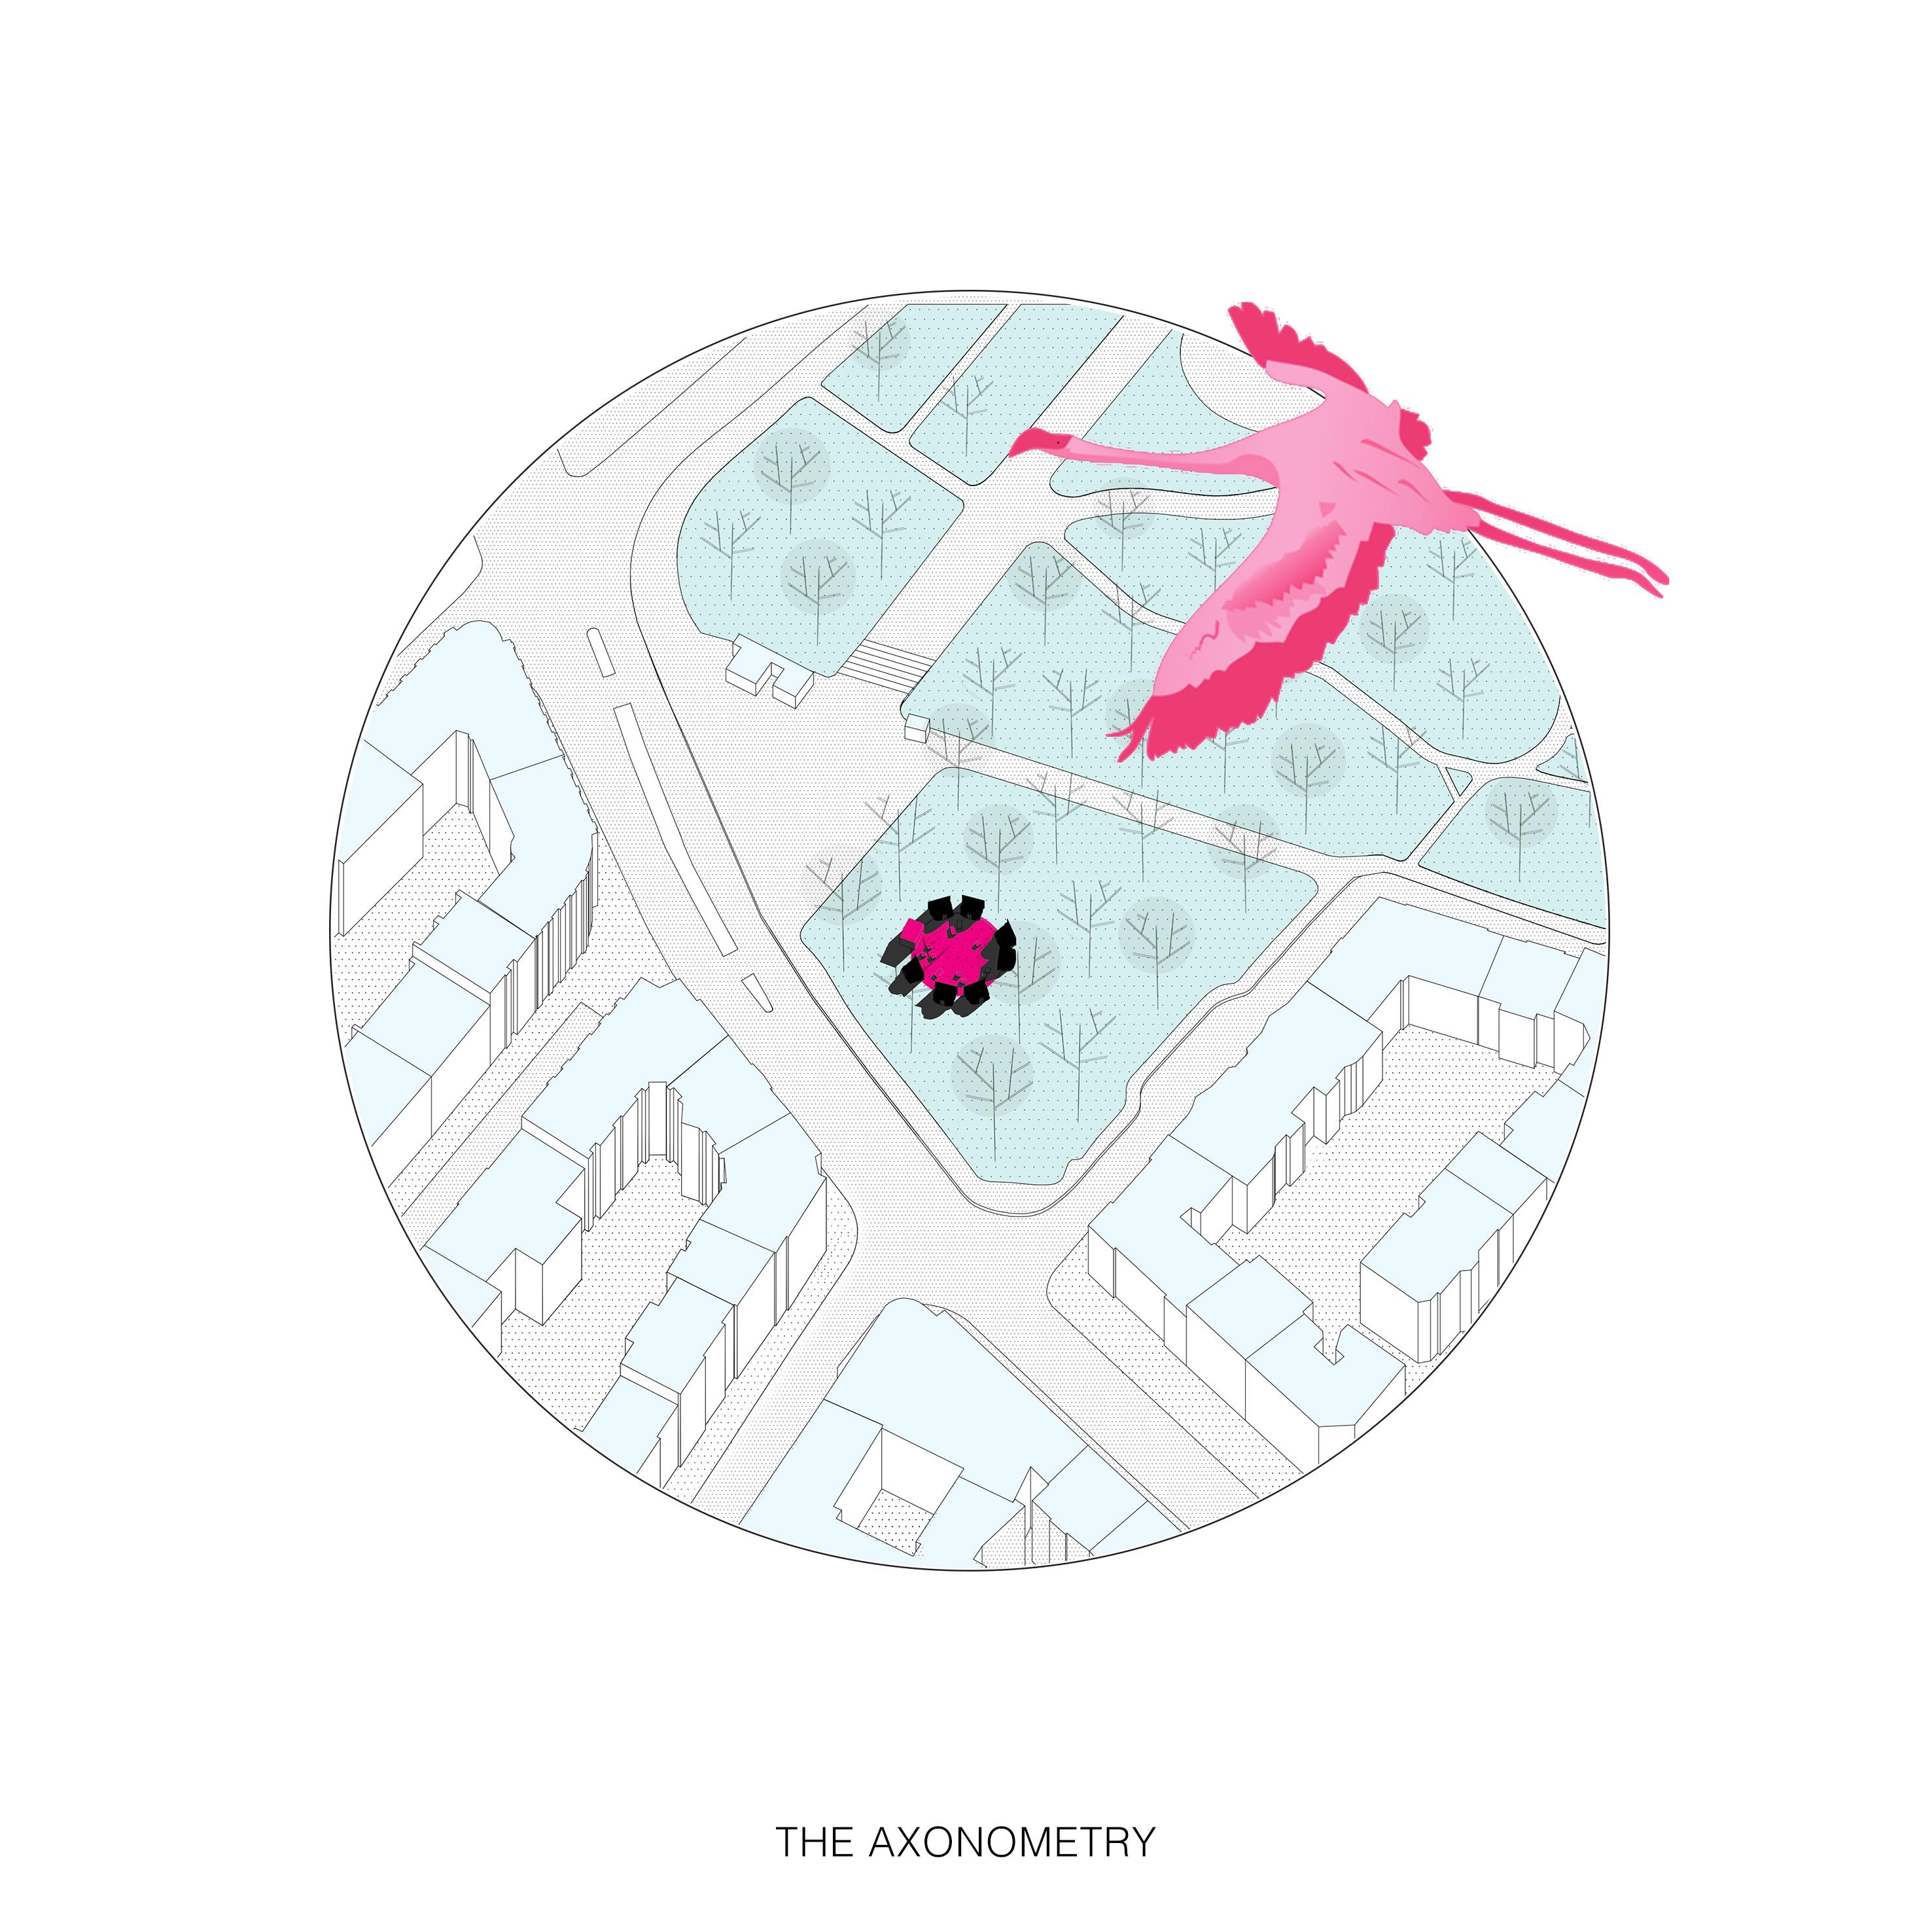 8_THE AXONOMETRY